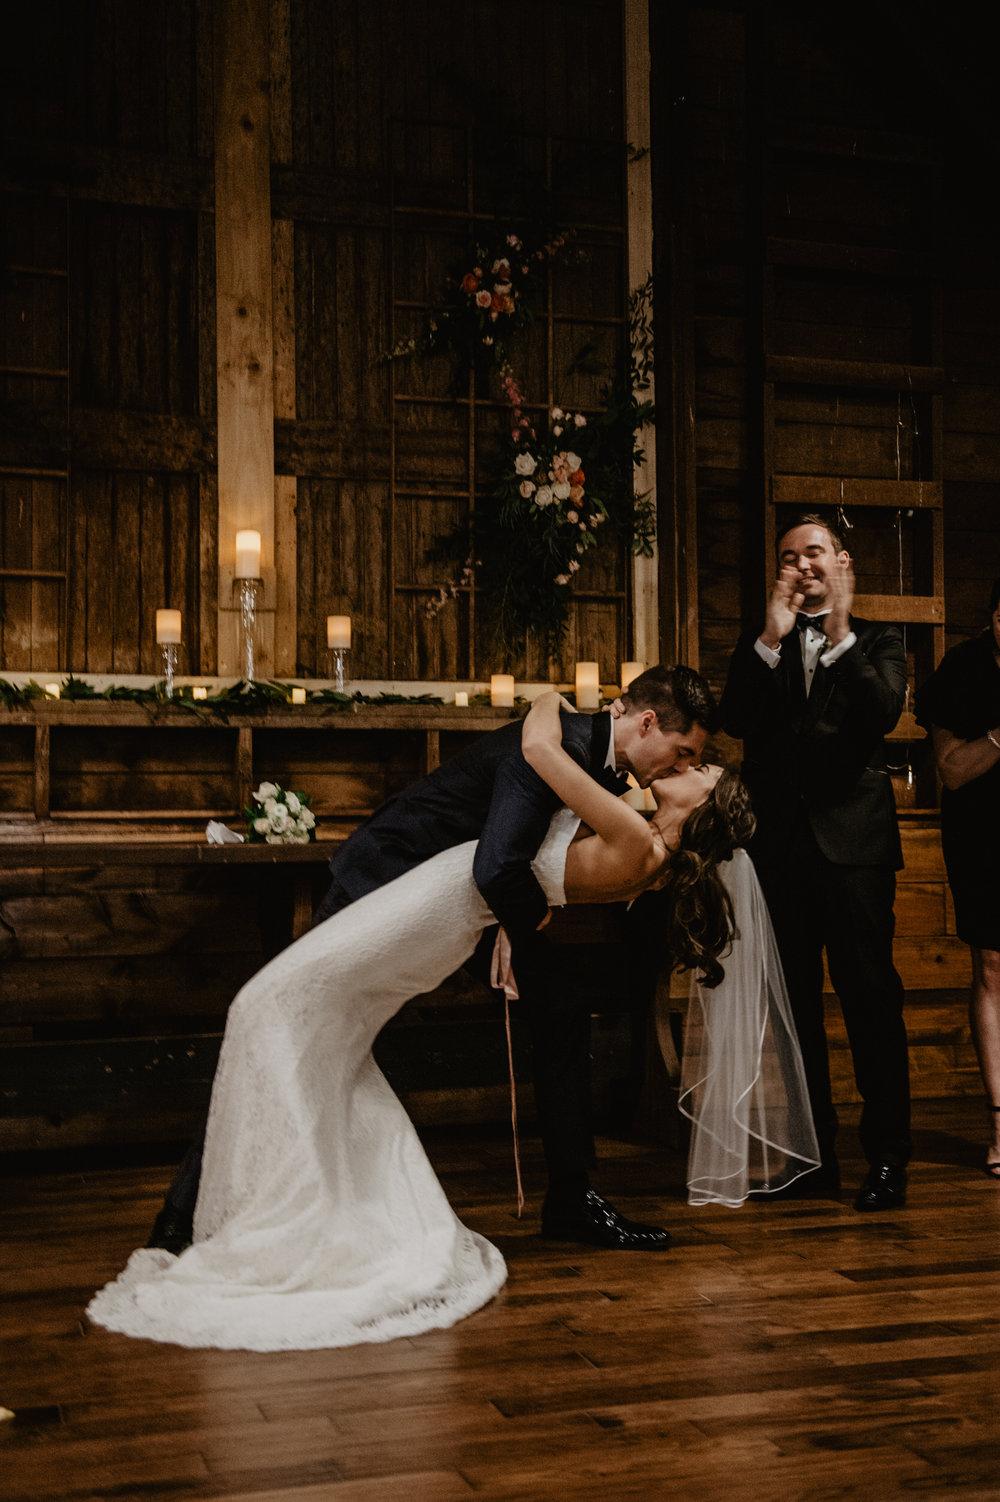 The Barn at the Ackerhurst Dairy Farm Omaha Nebraska Wedding Kaylie Sirek Photography079.jpg